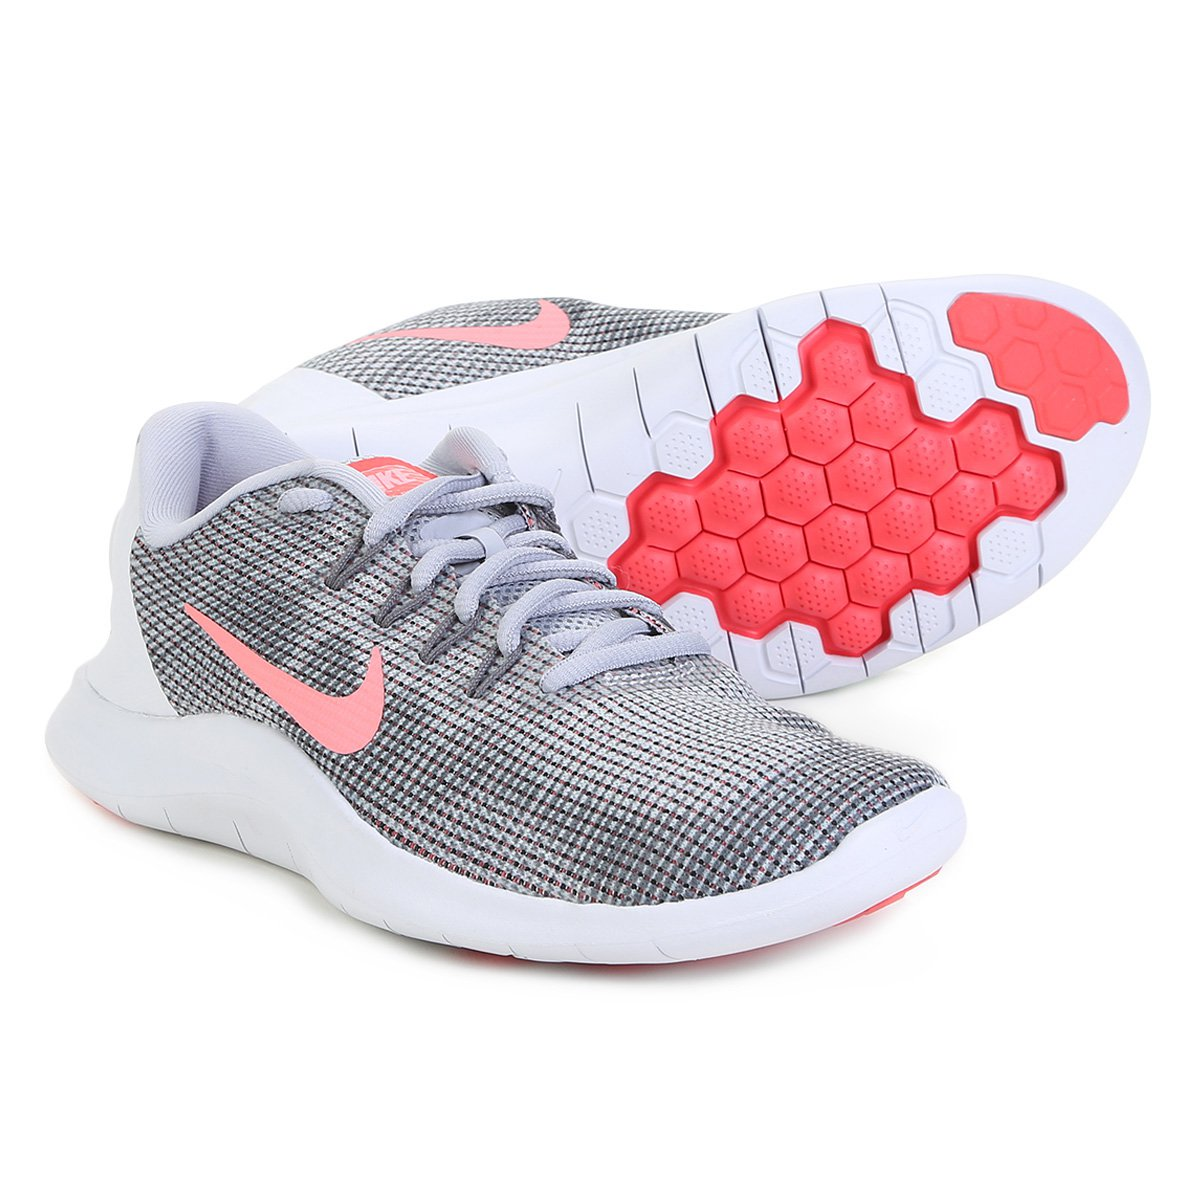 840b869c25a66 Tênis Nike Wmns Flex 2018 Rn Feminino. undefined